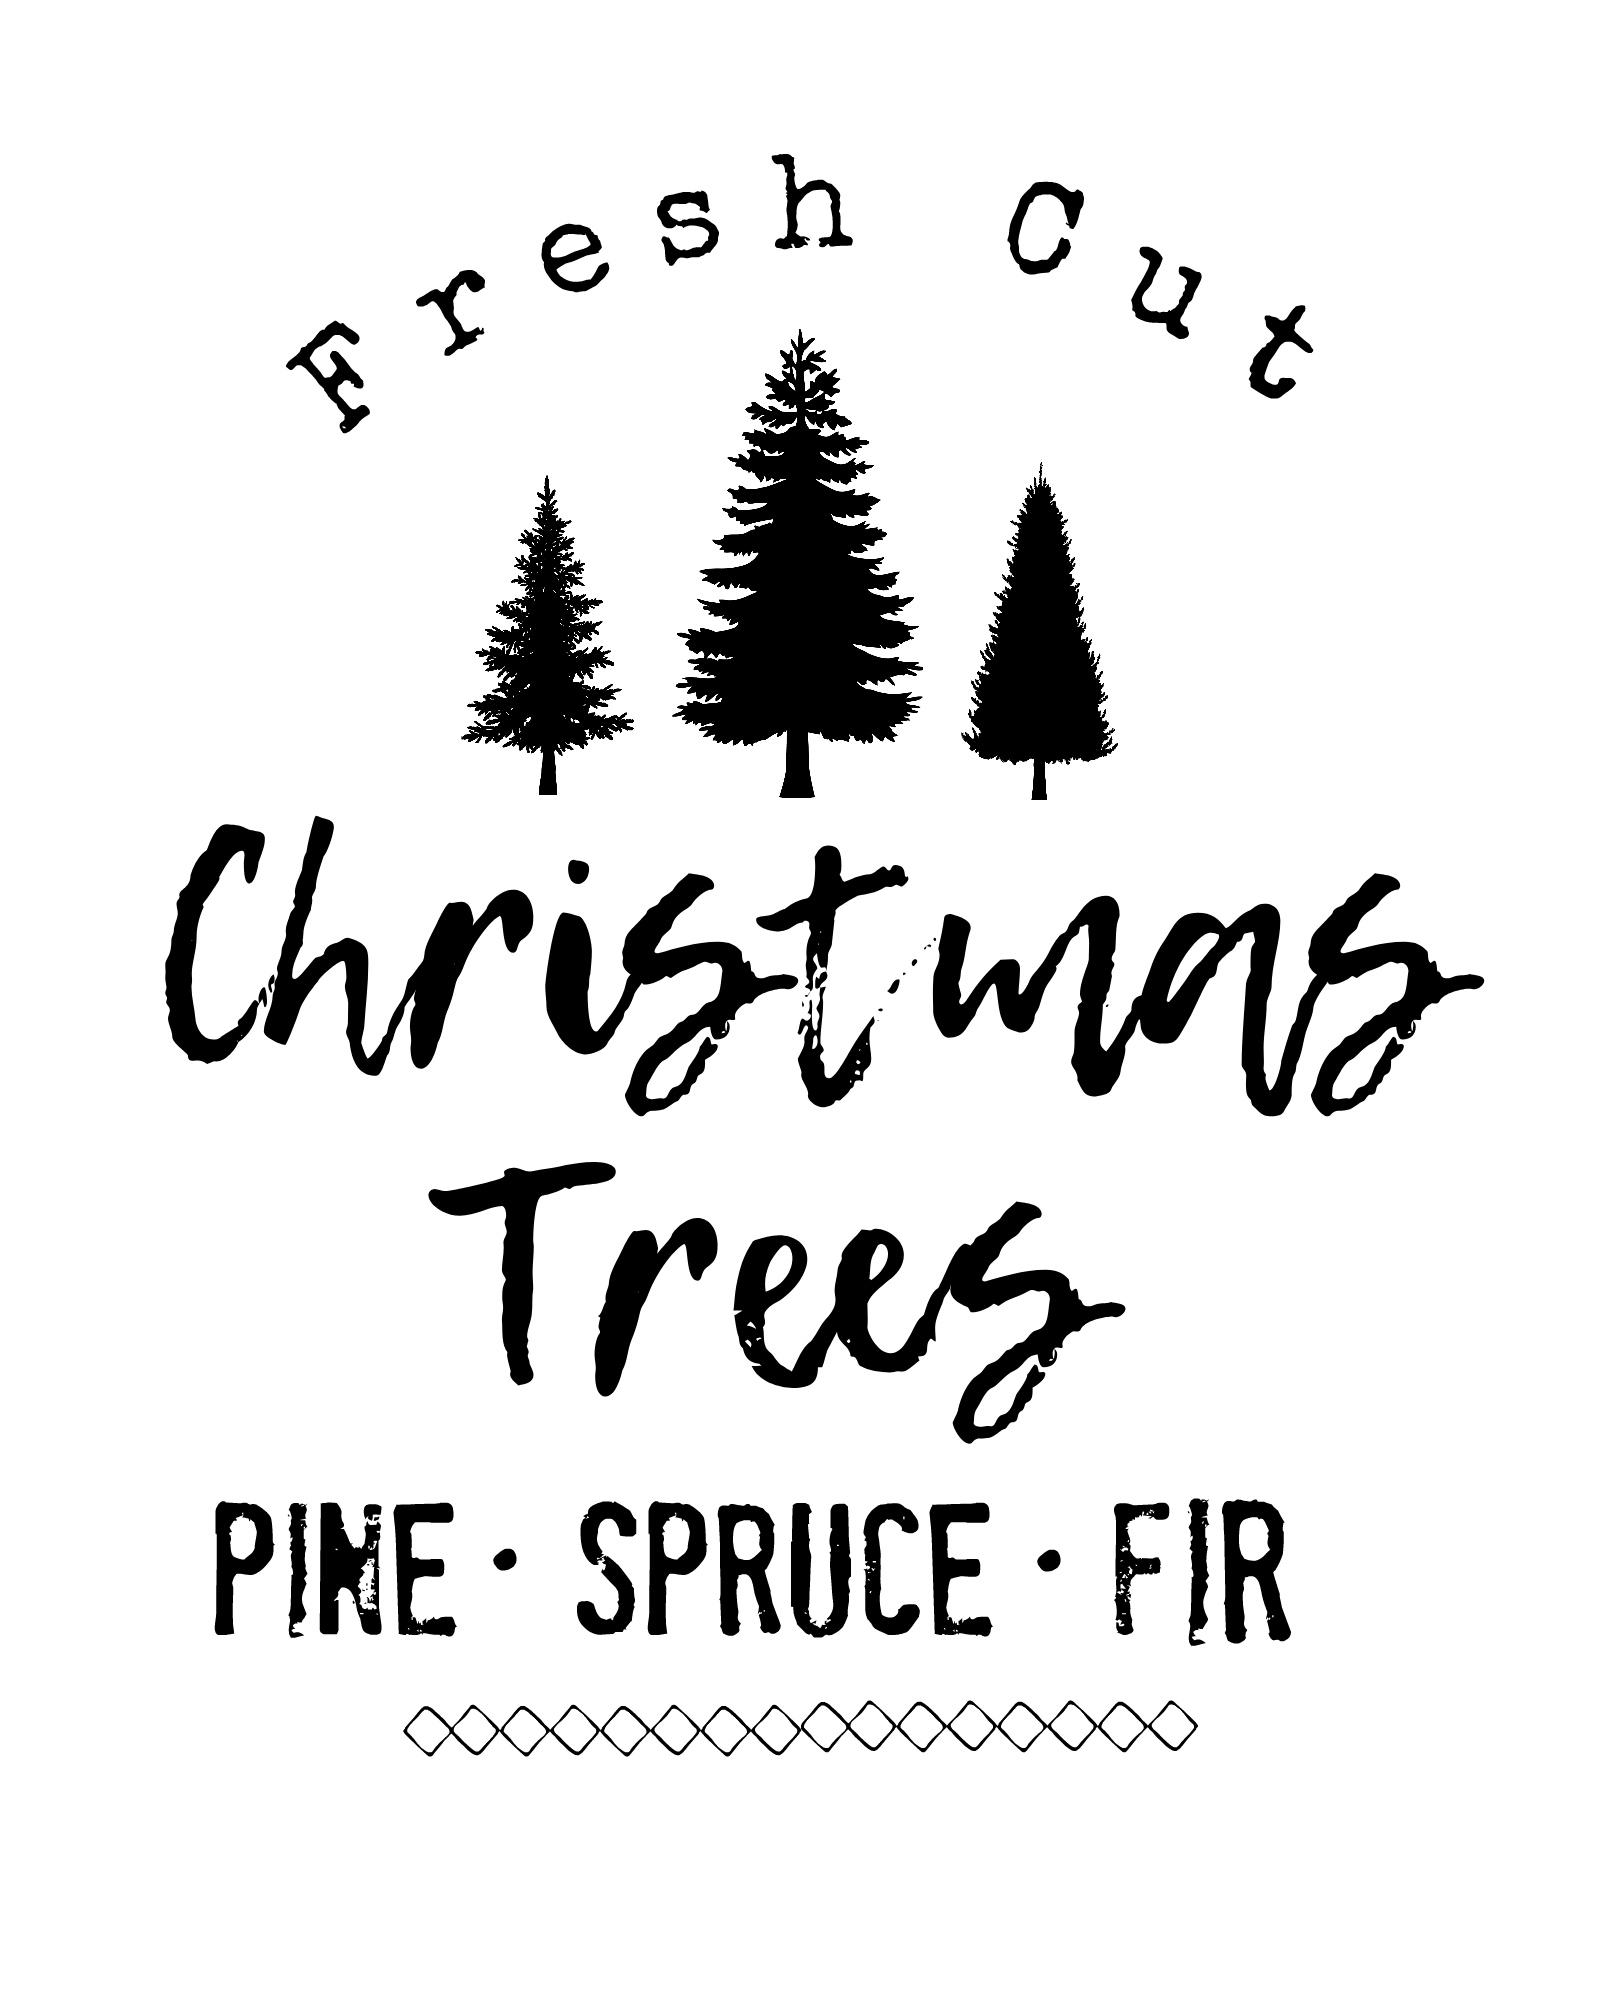 You Cut Christmas Trees Near Me